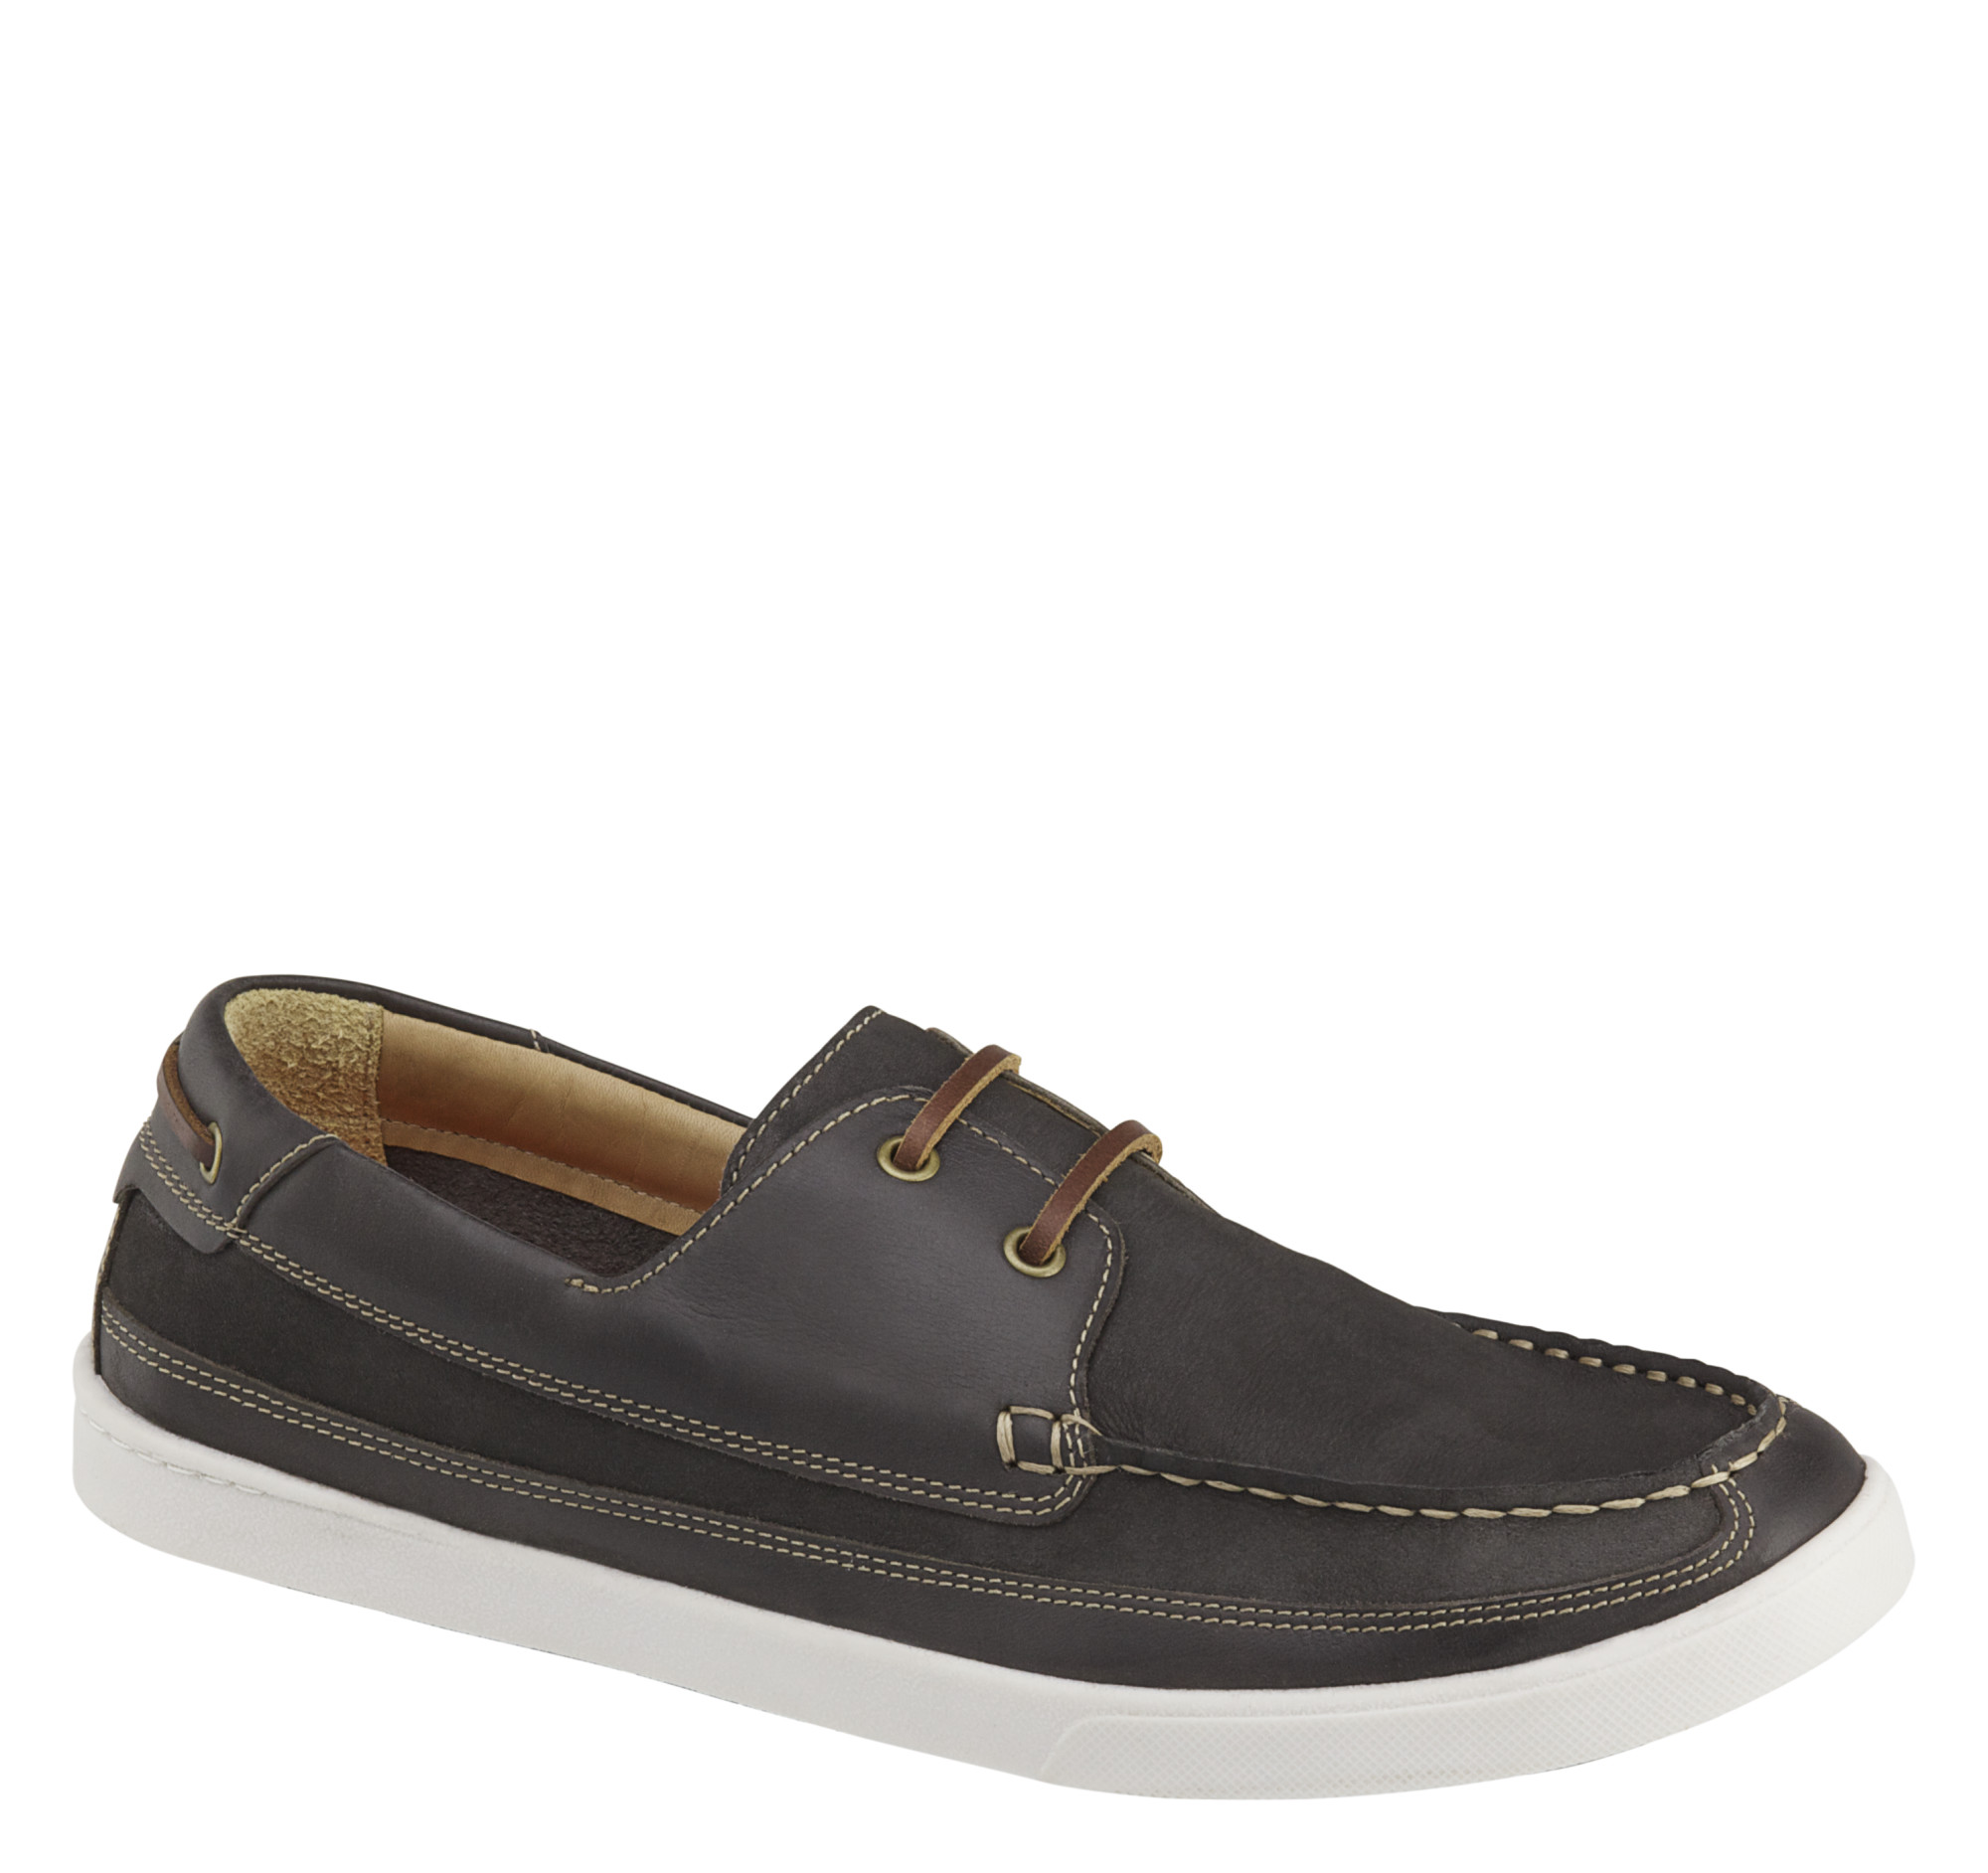 Johnston & Murphy Quinton Boat Shoe